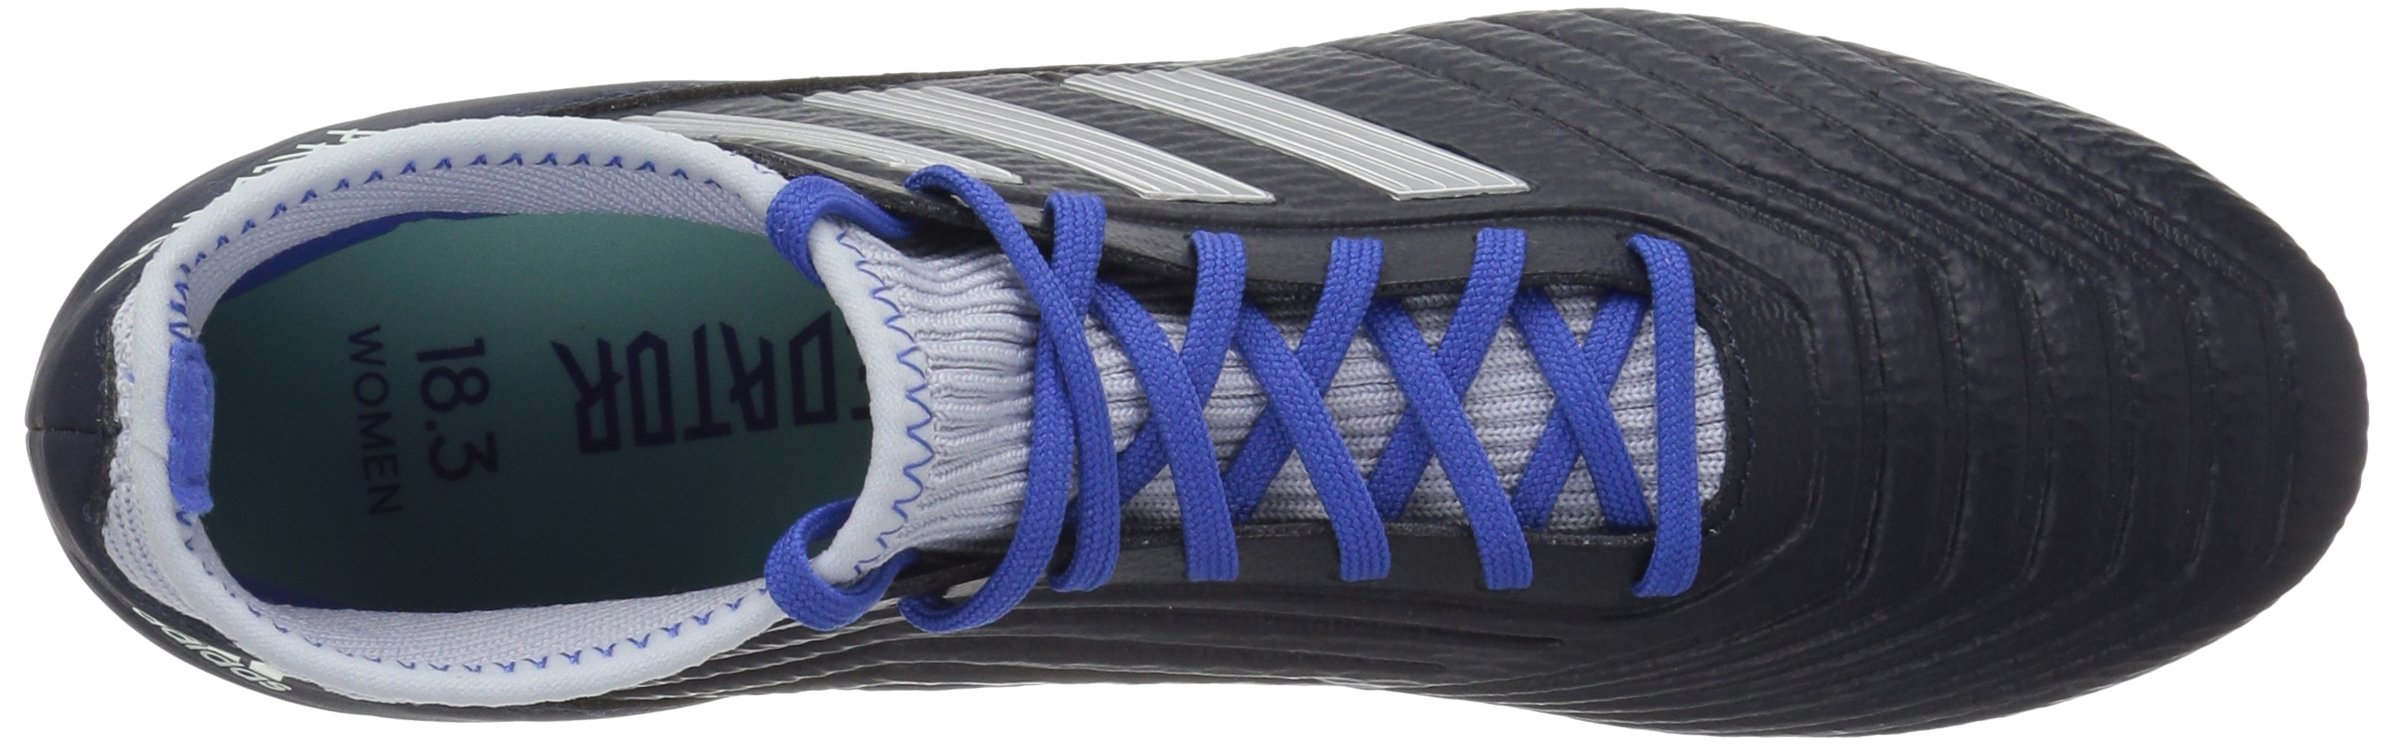 adidas Women's Predator 18.3 Firm Ground Soccer Shoe Legend Ink/Silver Metallic/aero Blue 5.5 M US by adidas (Image #7)